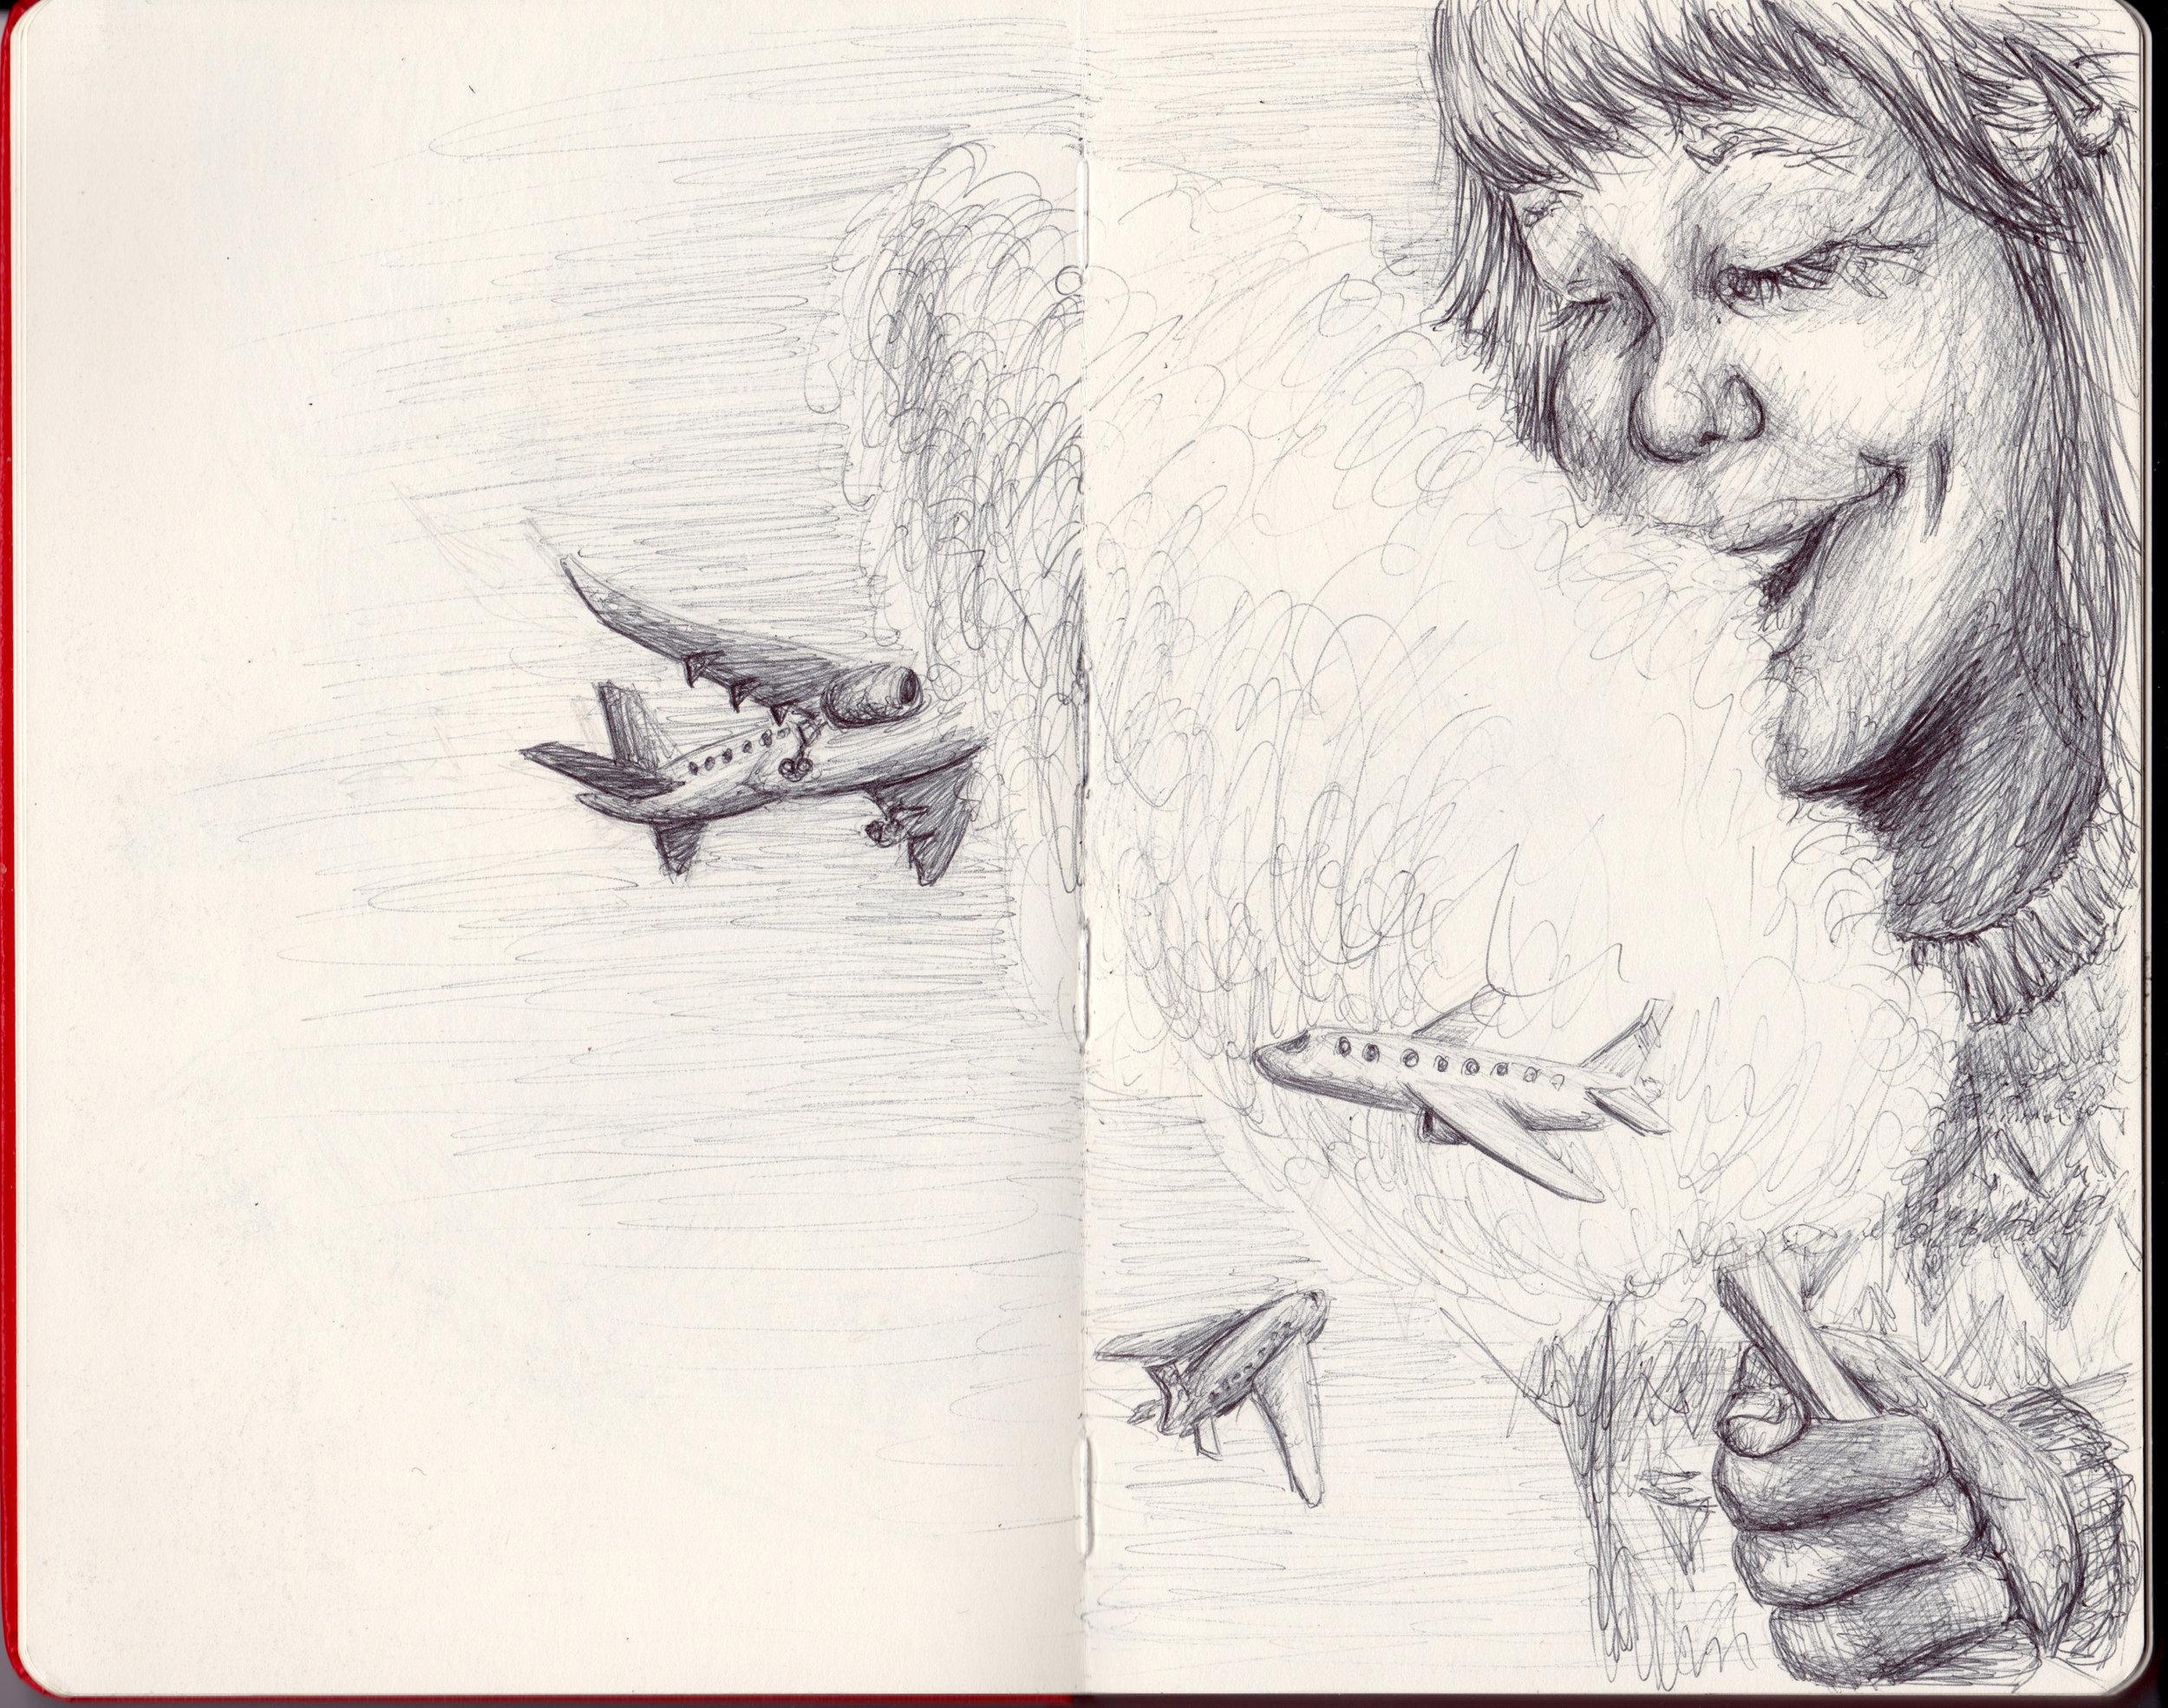 ׳inter sketch 3